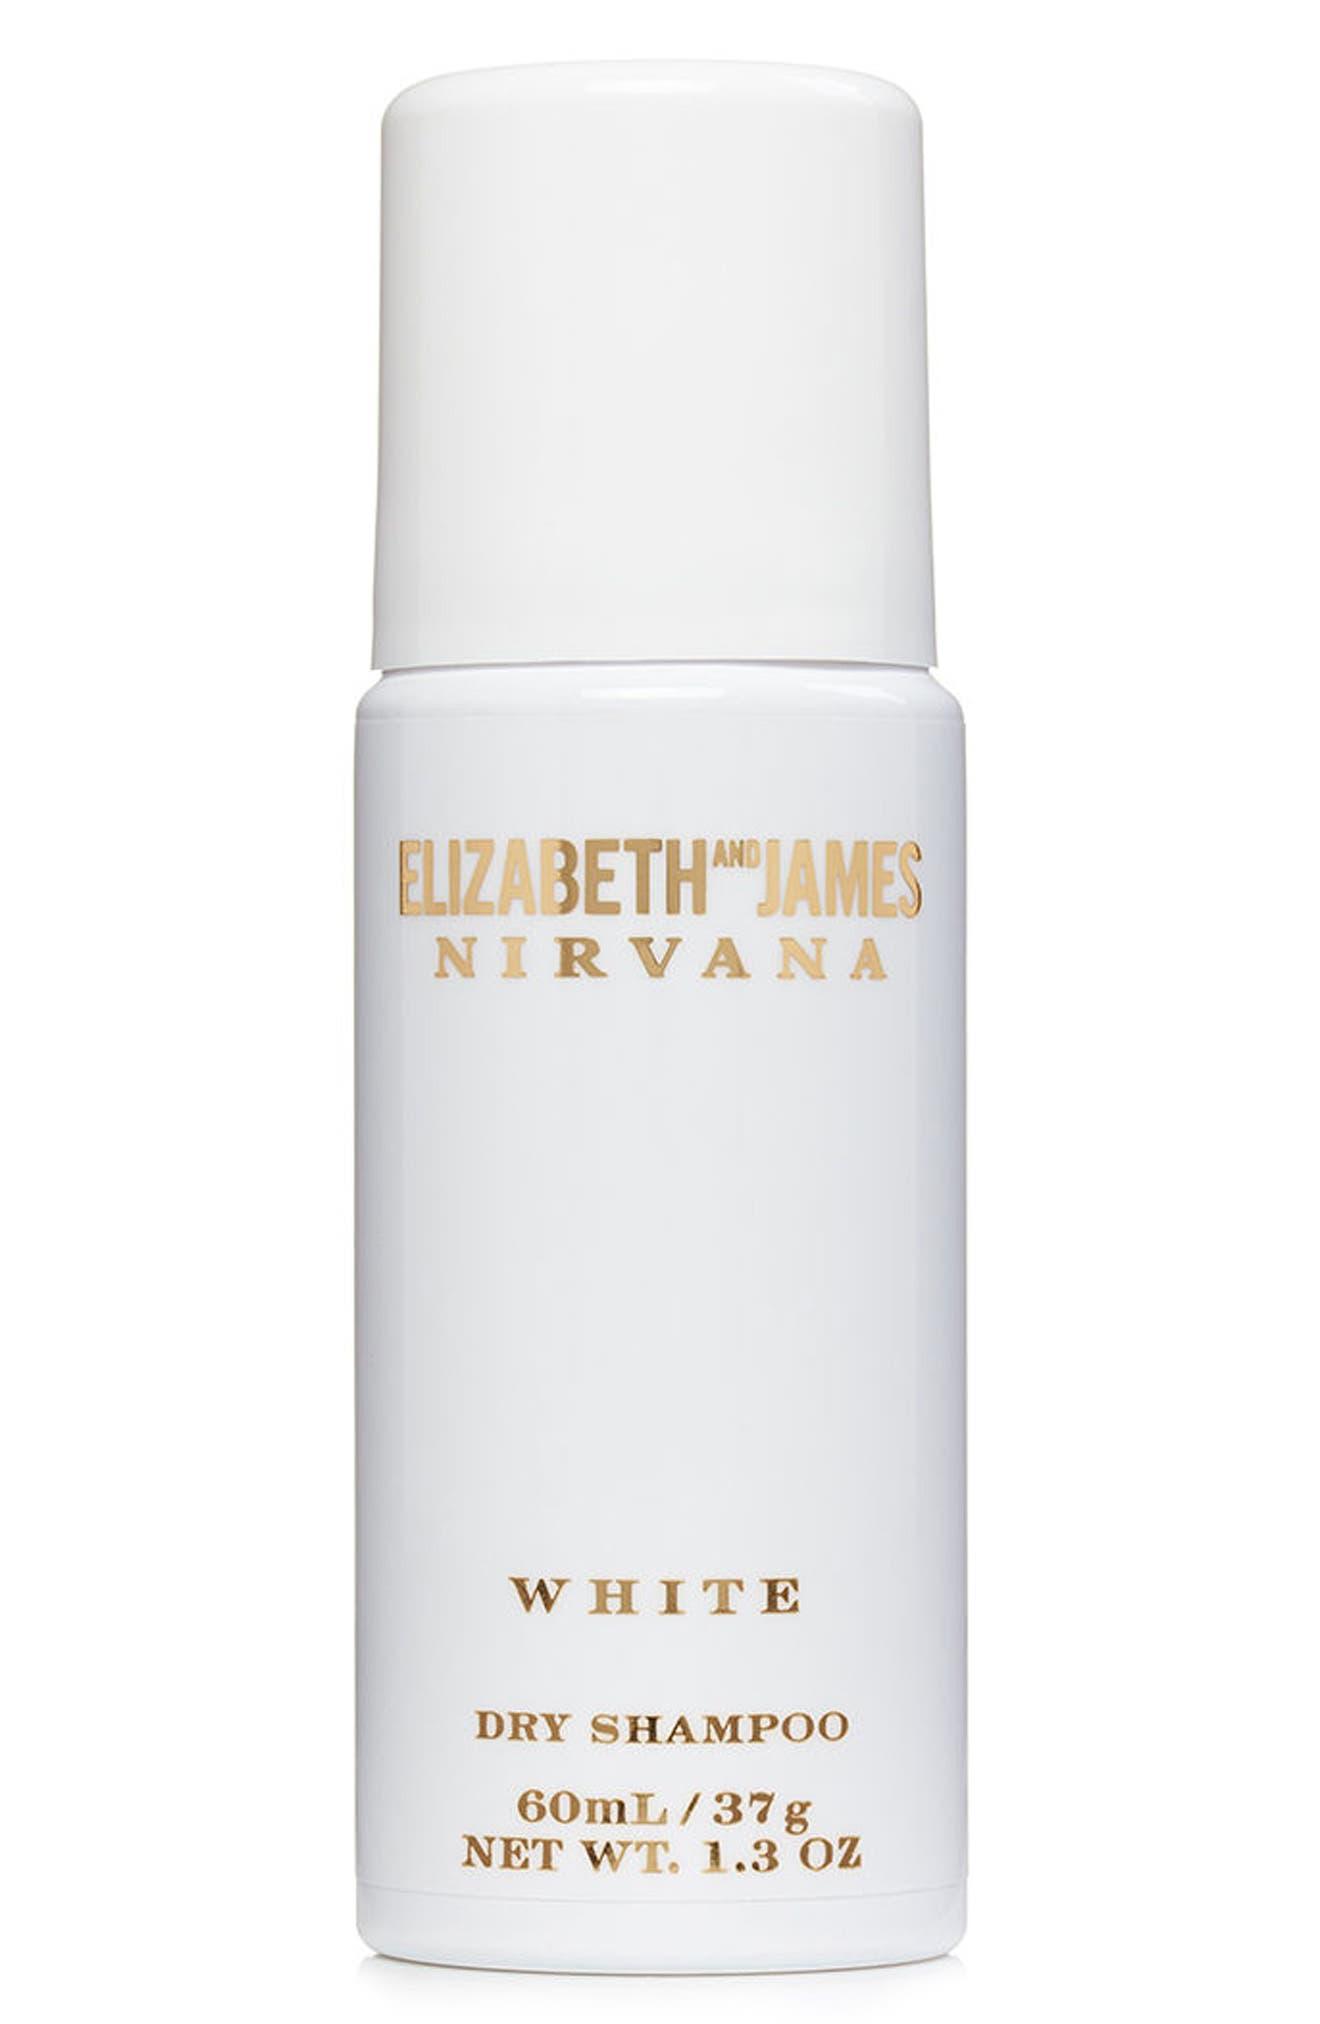 ELIZABETH AND JAMES NIRVANA White Dry Shampoo Mini